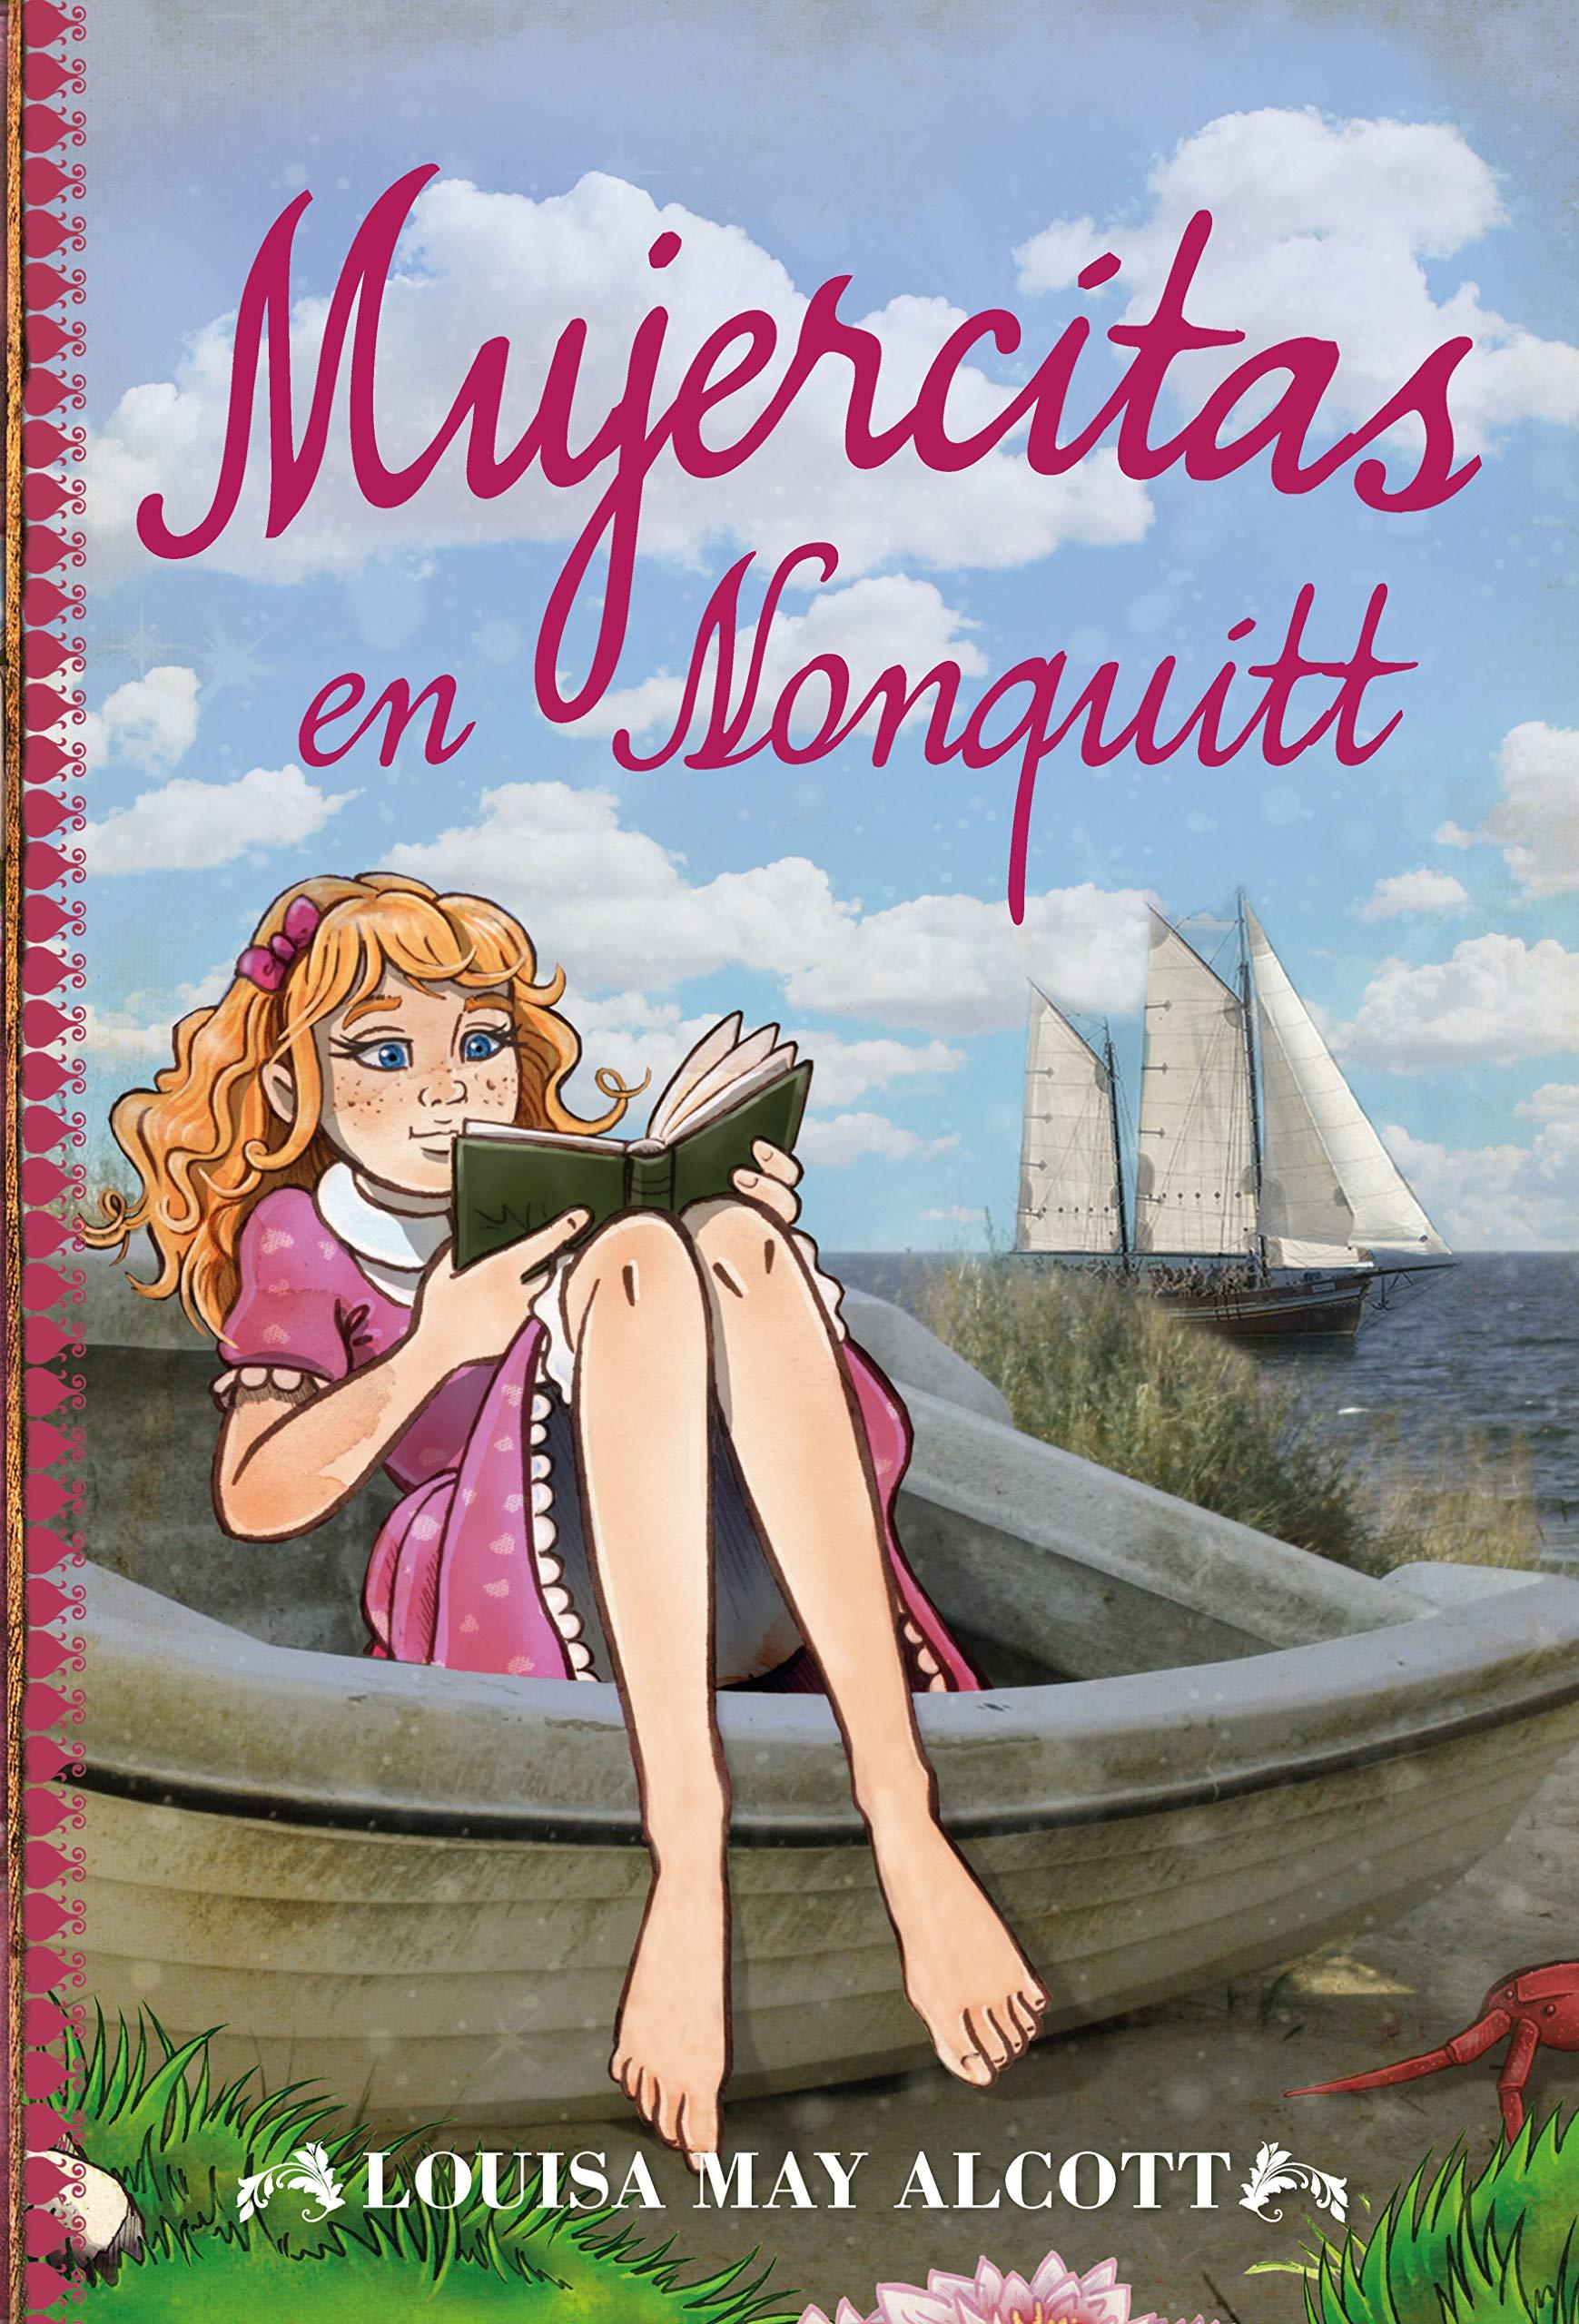 Mujercitas en Nonquitt (Toromítico): Amazon.es: Louise May Alcott ...